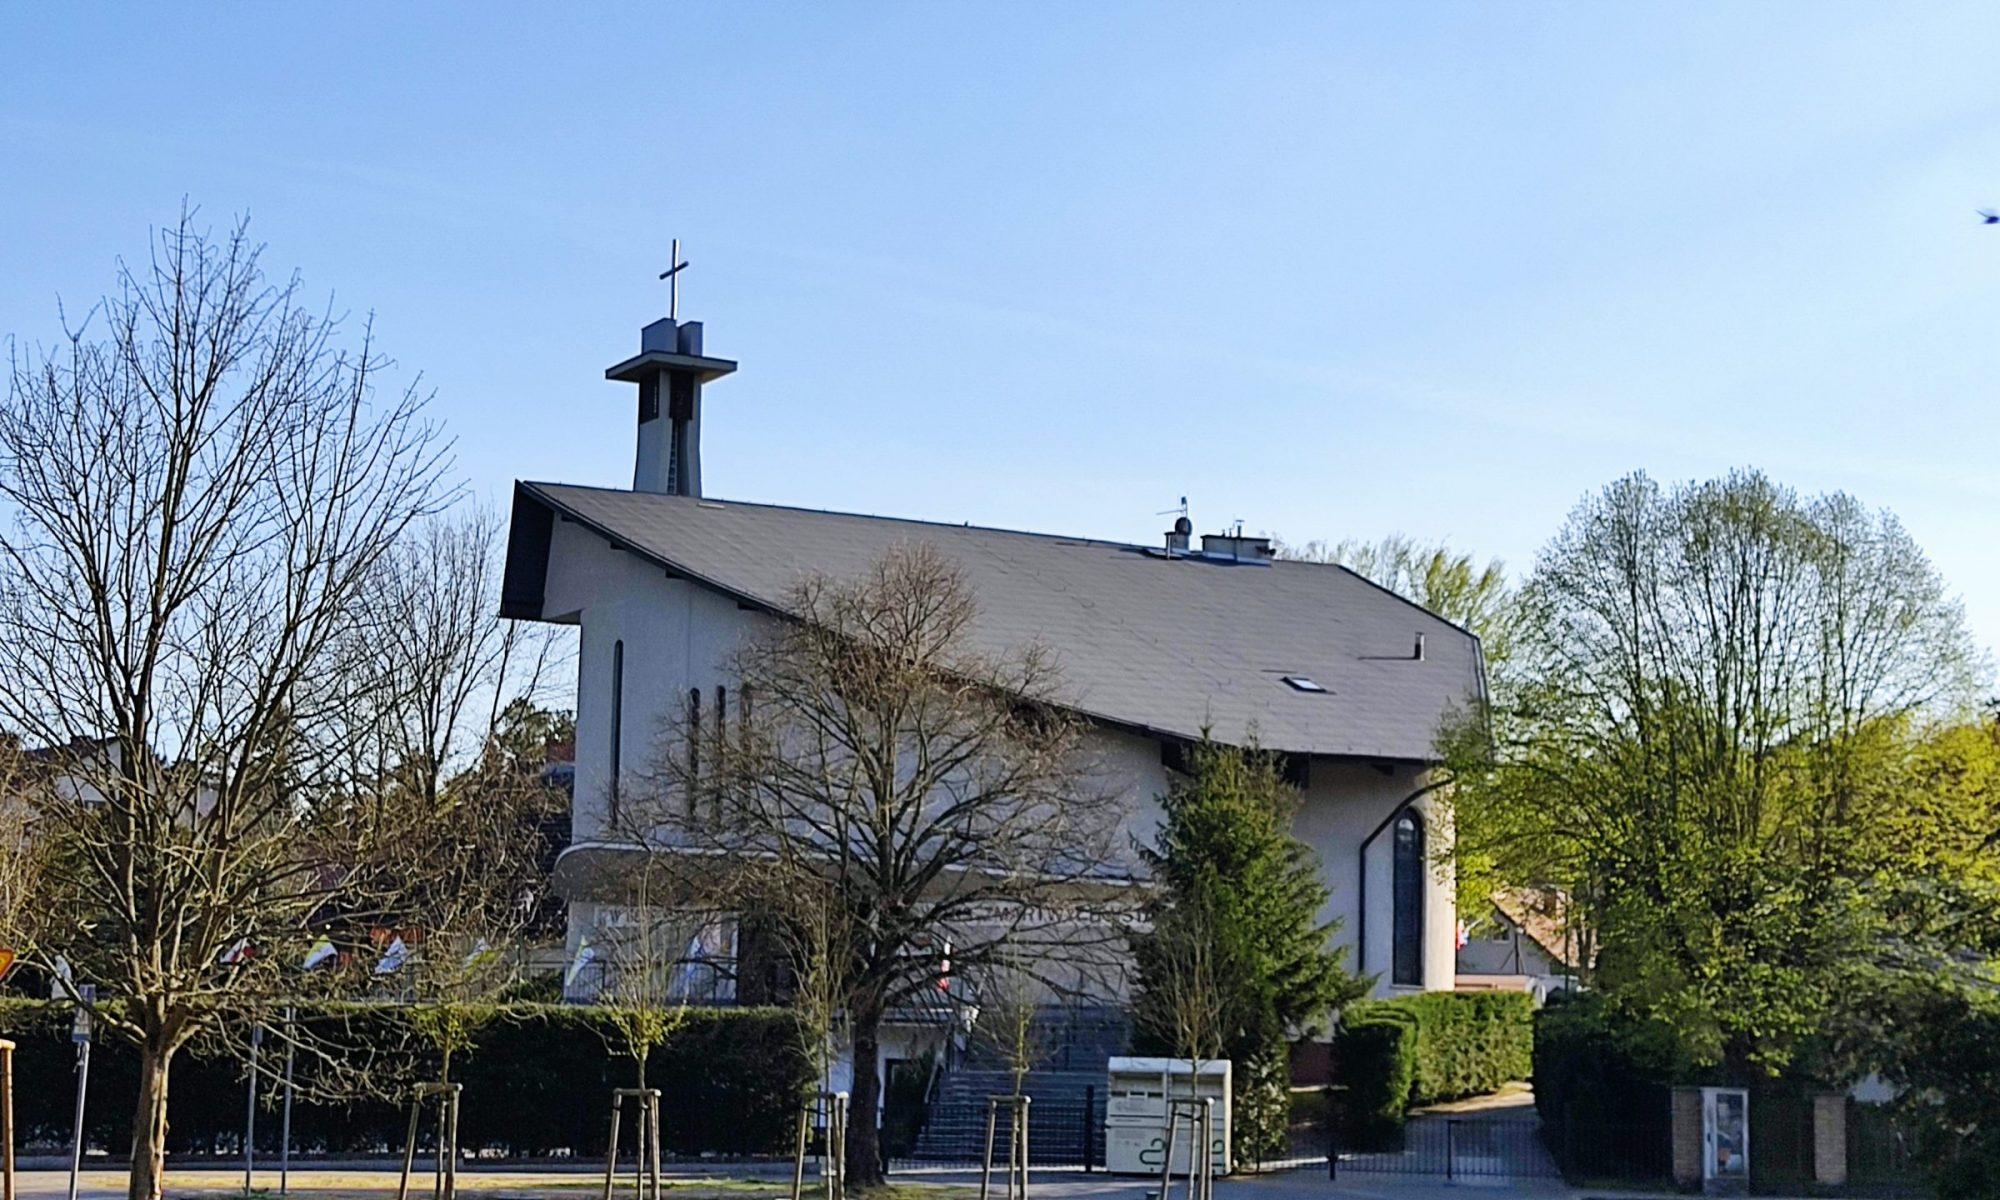 Parafia Św. Brata Alberta